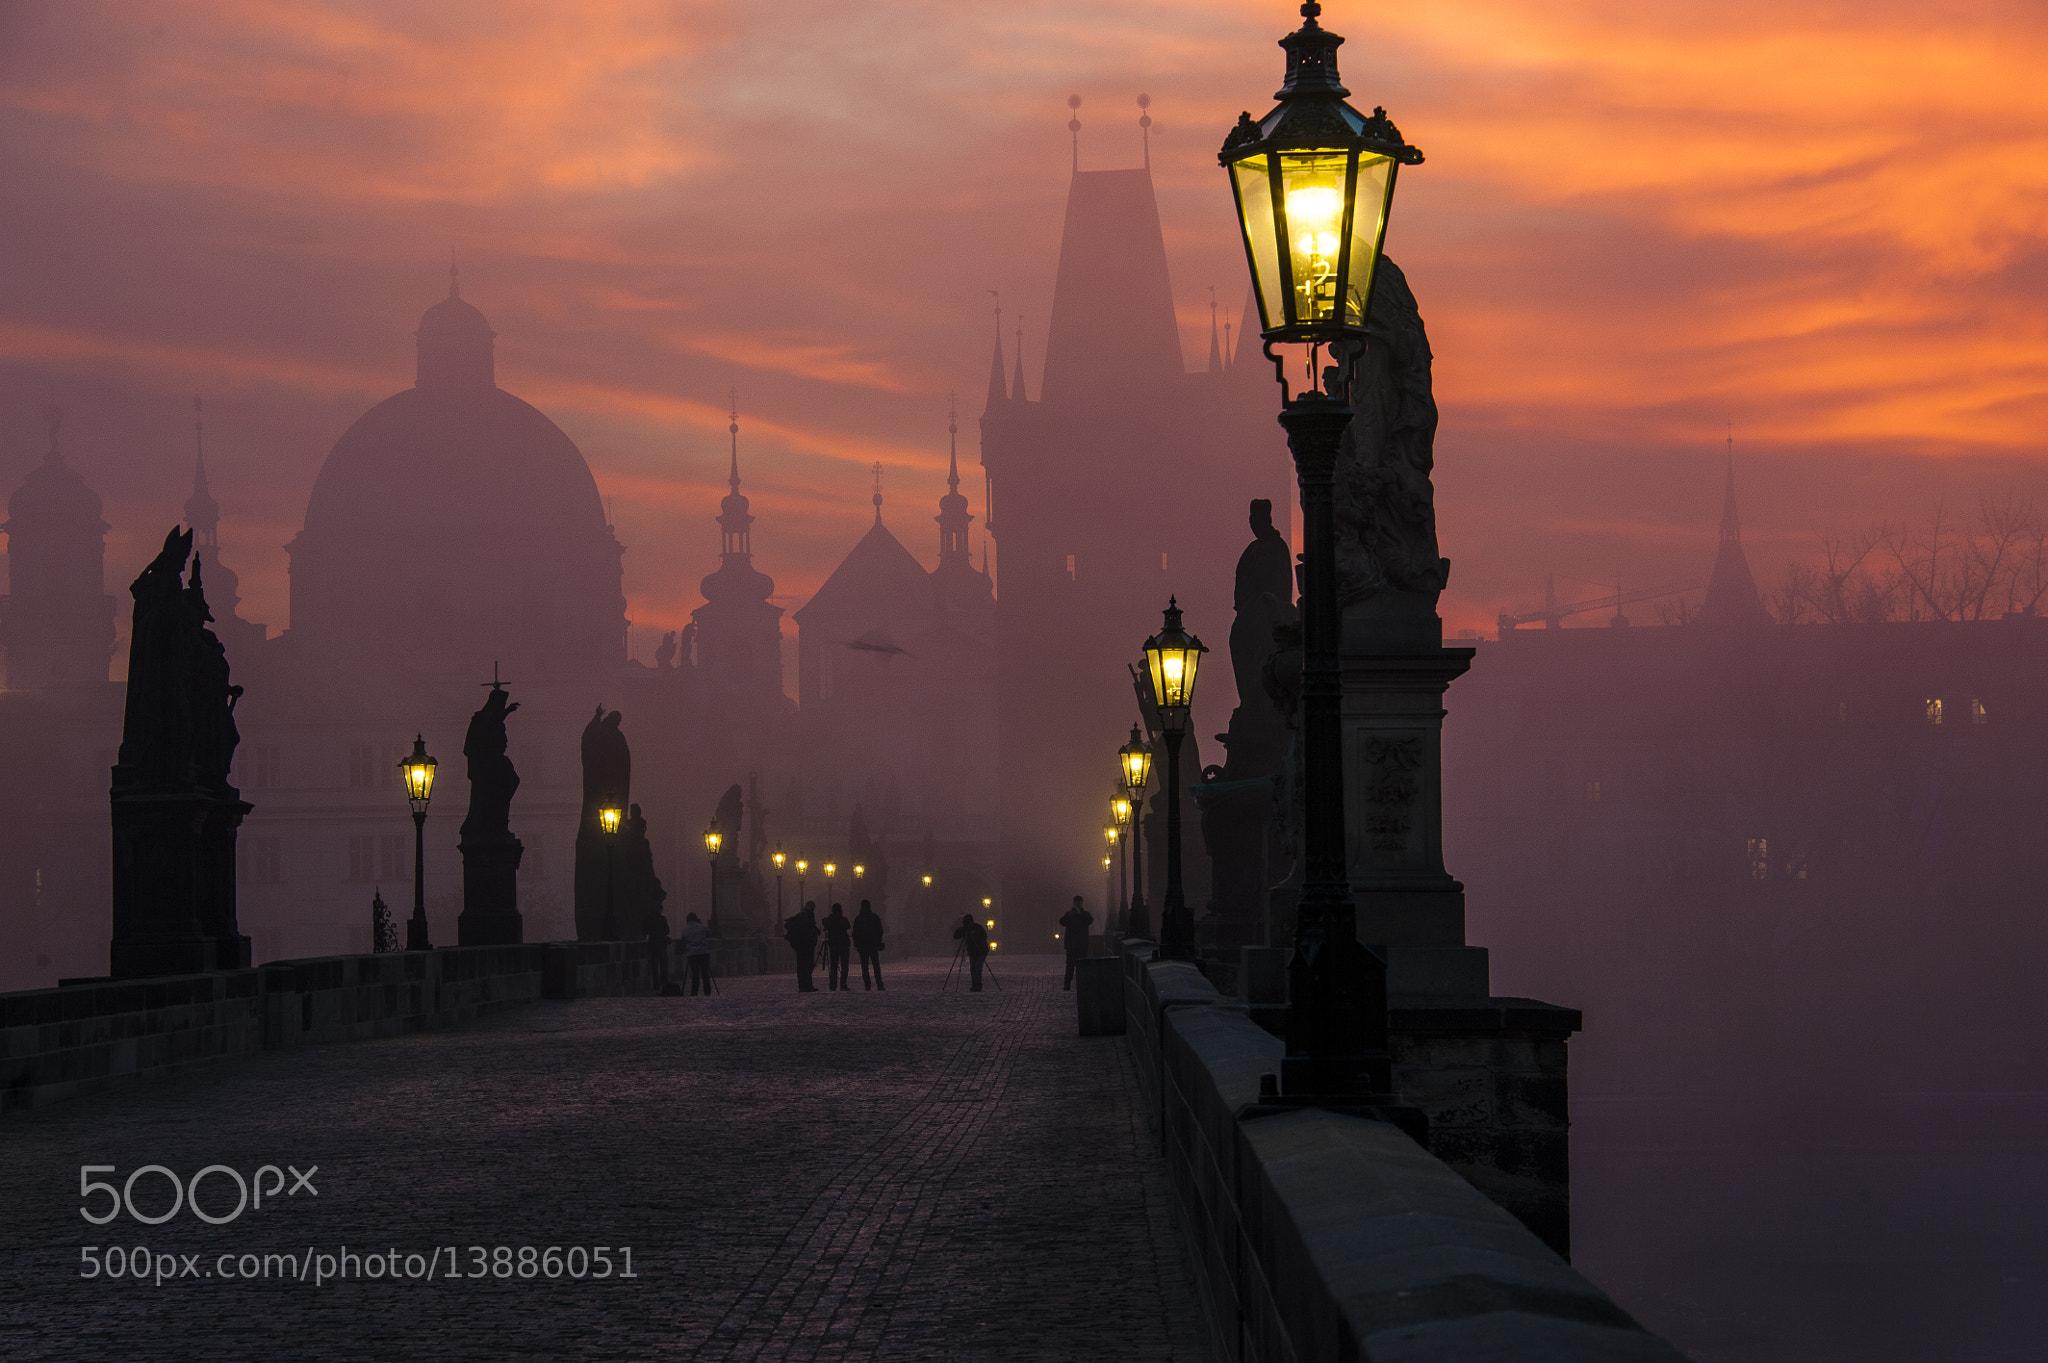 Photograph Daybreak by Markus Grunau on 500px